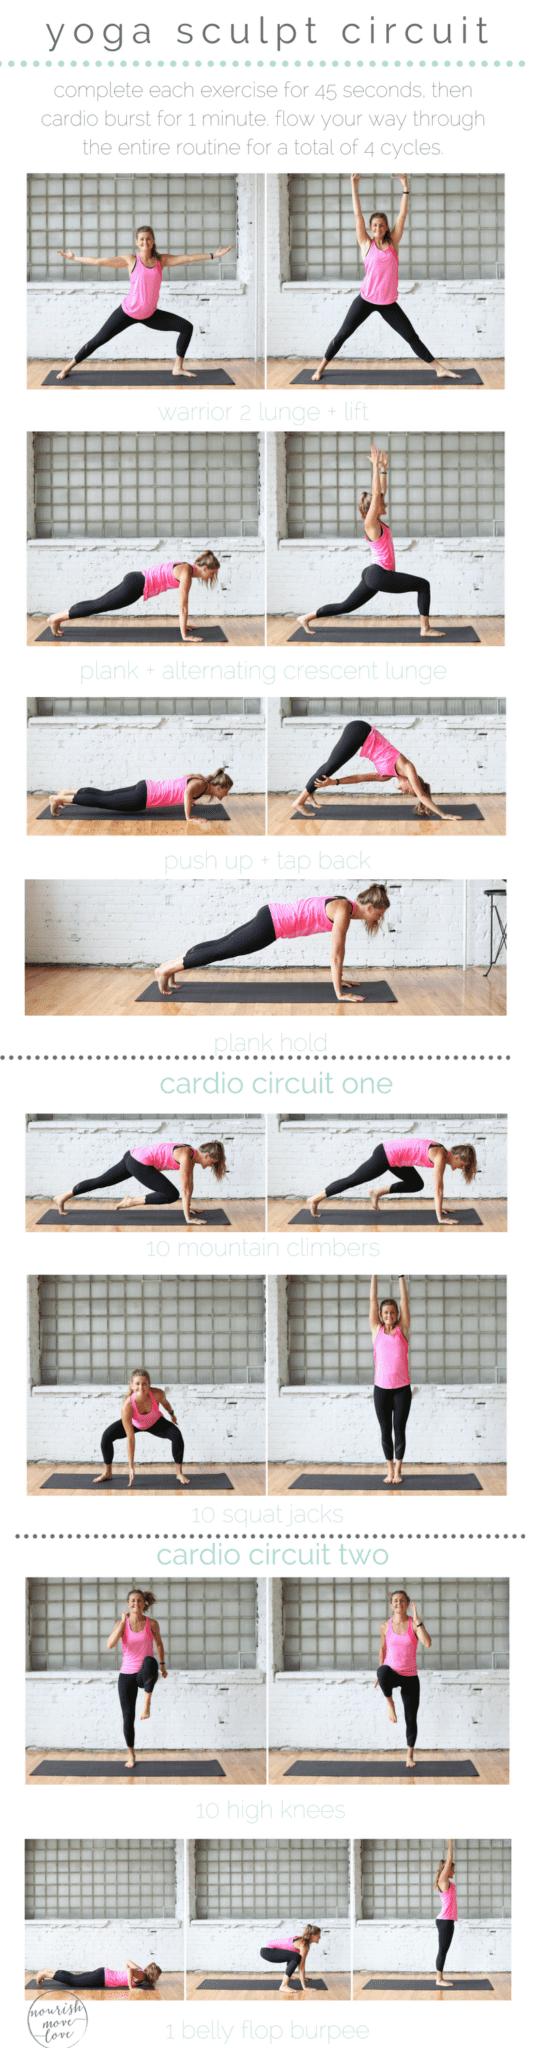 yoga sculpt circuit workout | www.nourishmovelove.com